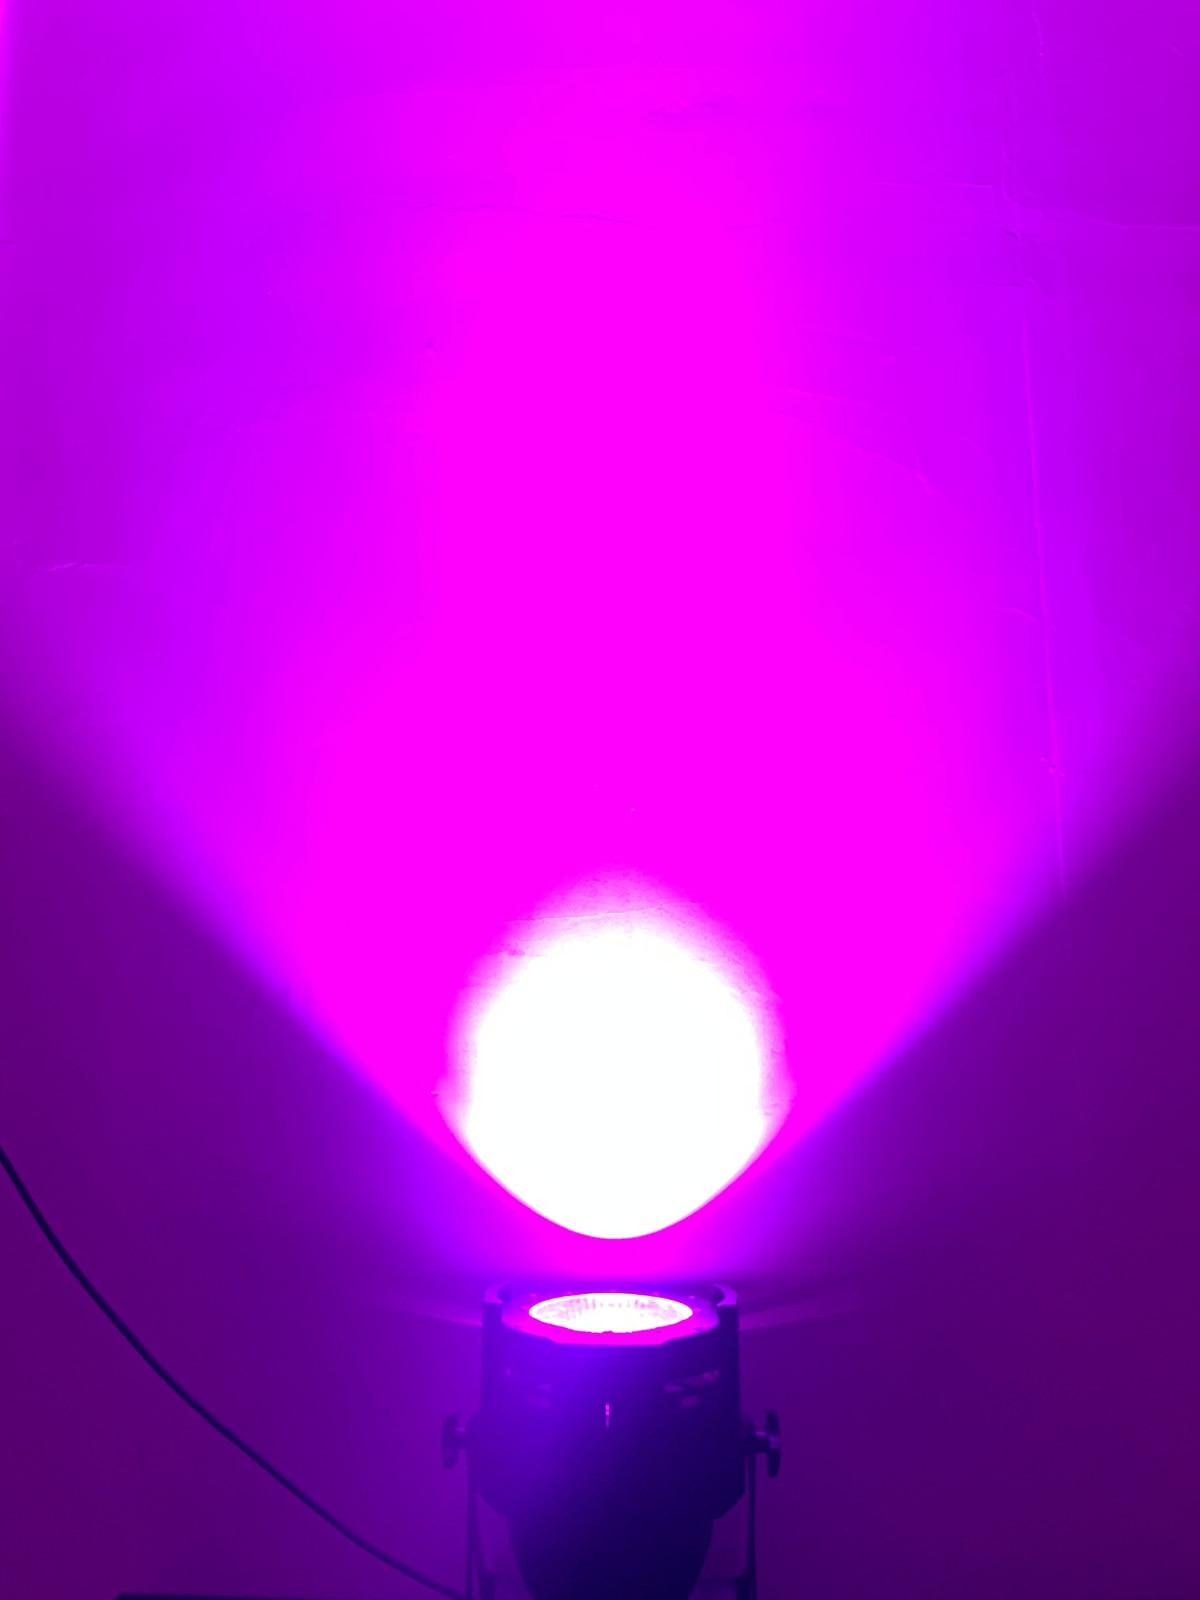 LED par 200W COB RGBWA UV 5in1/RGBW 4in1/RGB 3in1/ Warm White Cold white UV LED Par Par64 led spotlight dj light - 3